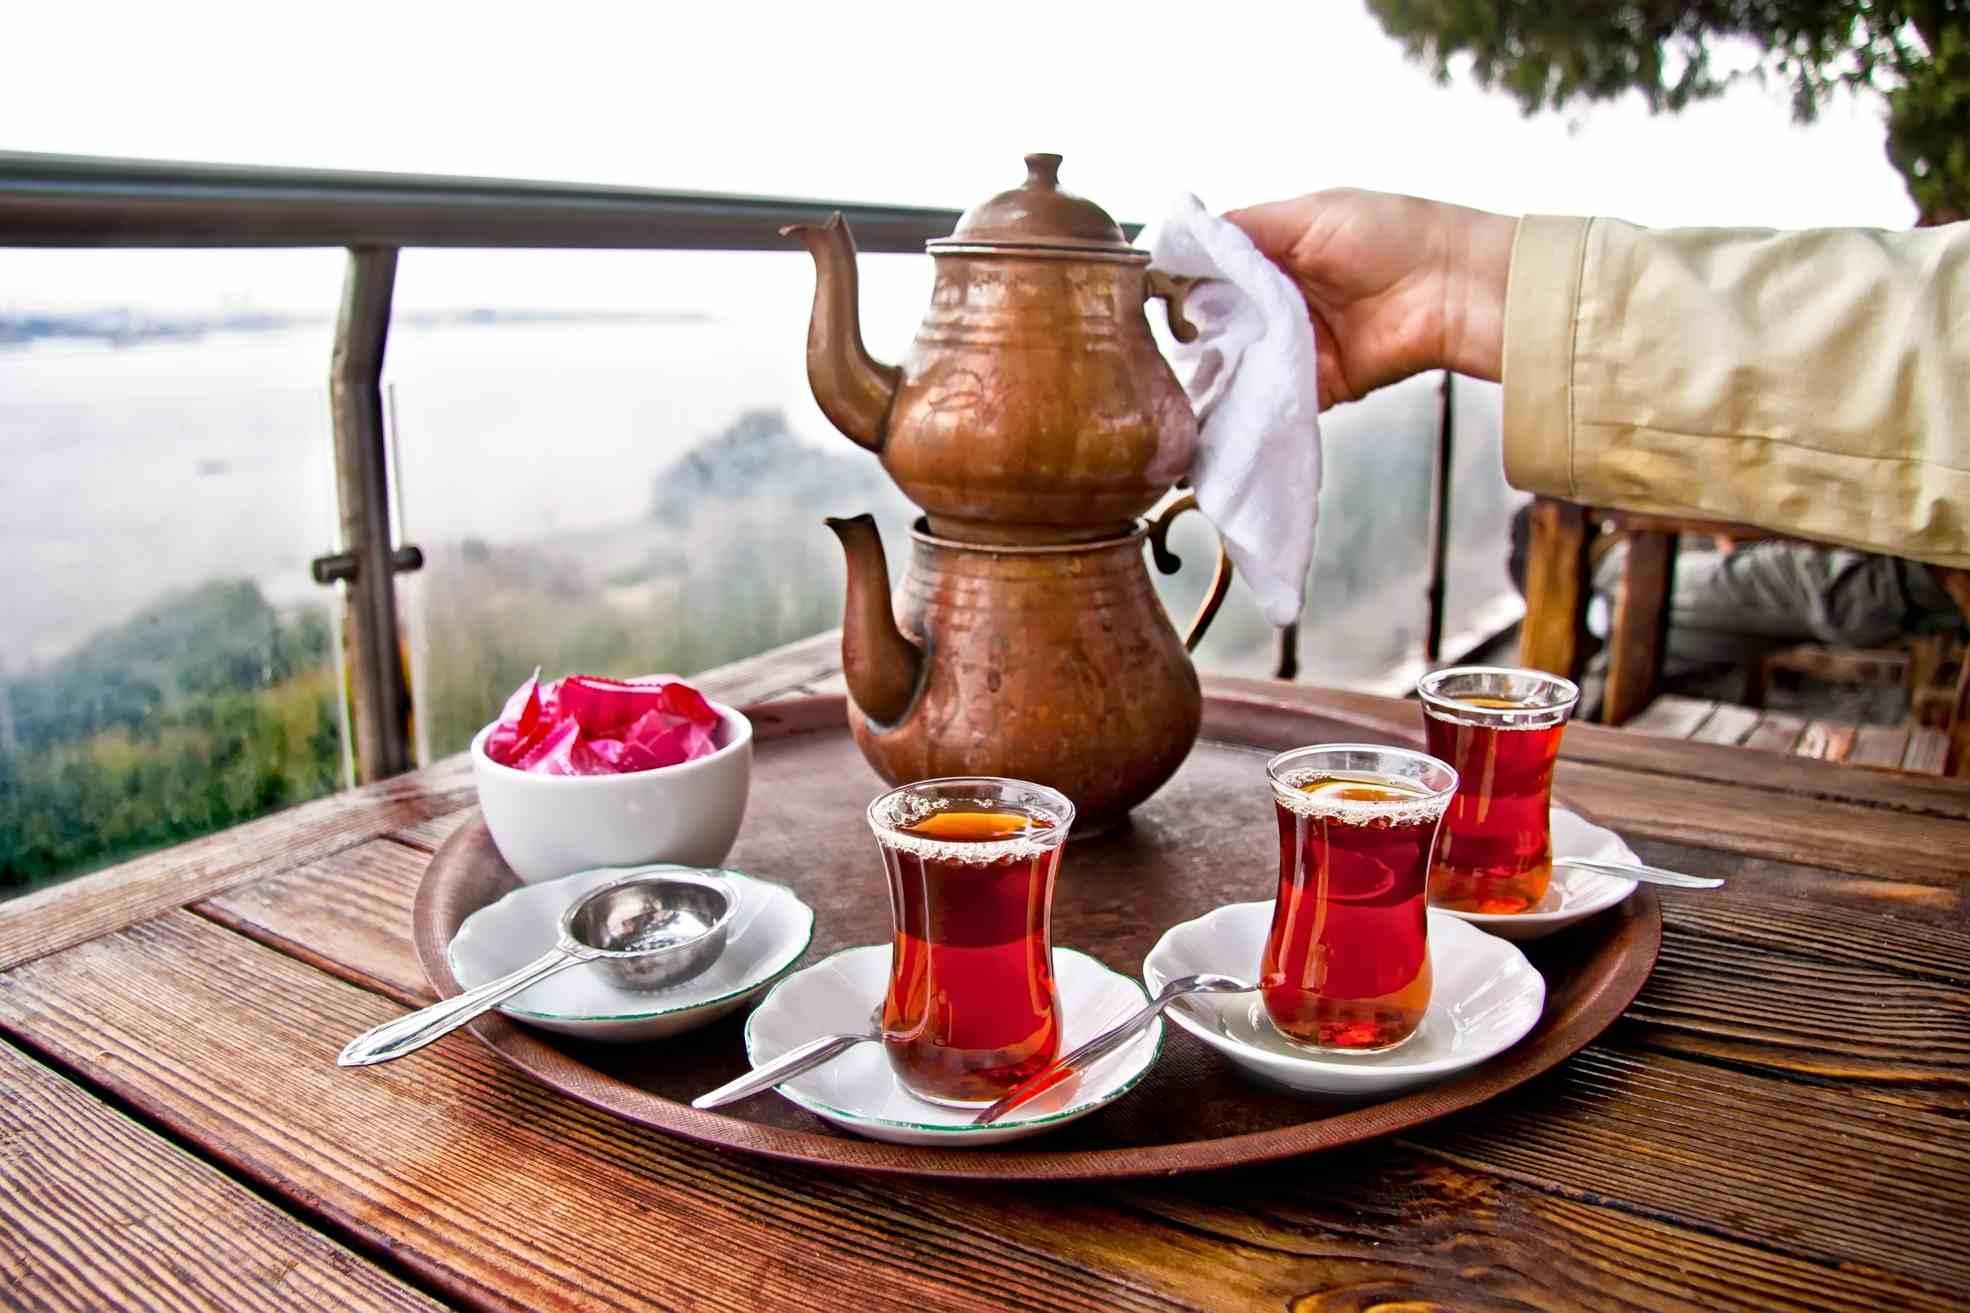 Турецкий чайник на столе